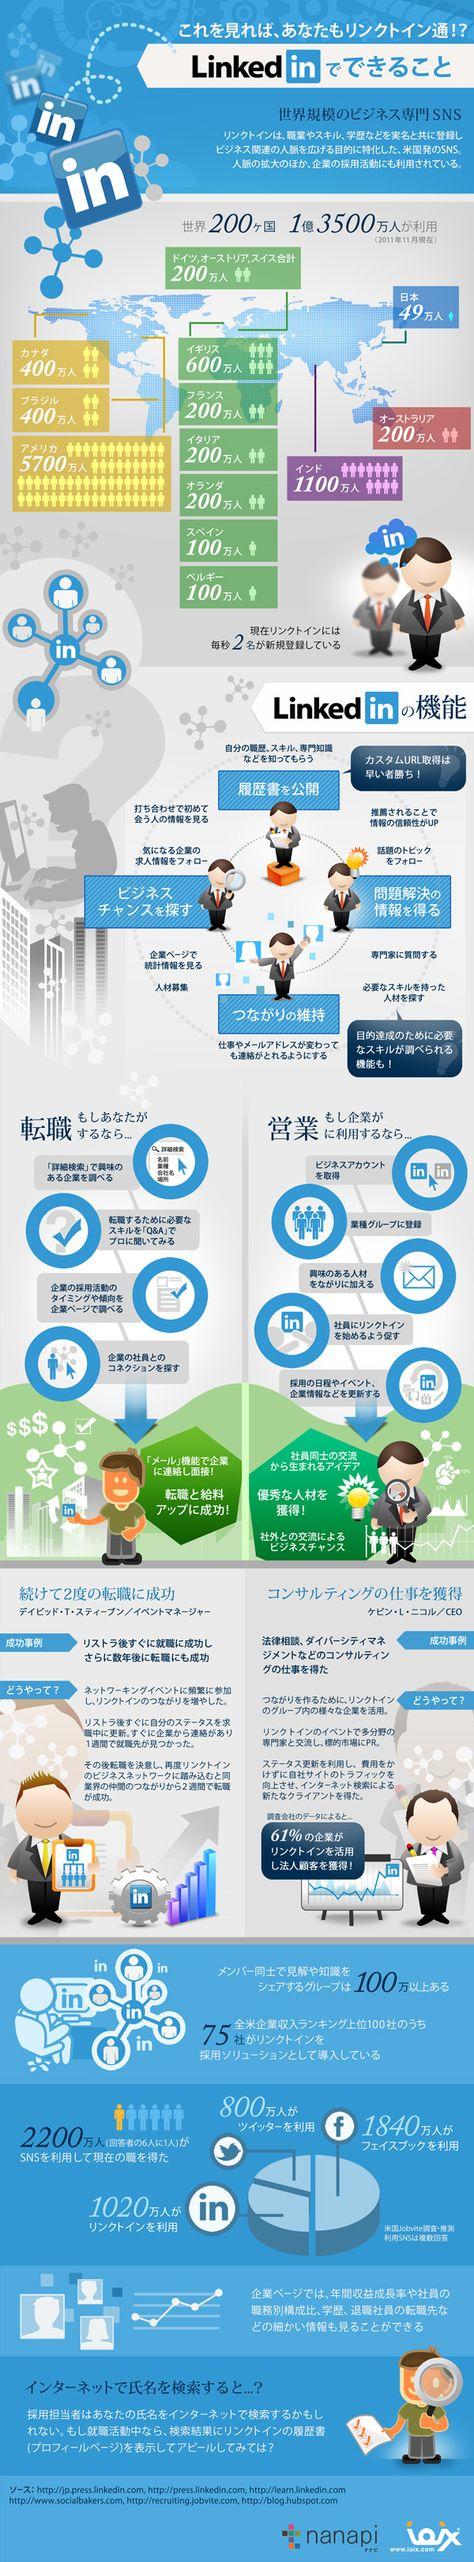 about Linkedin (Japanese)